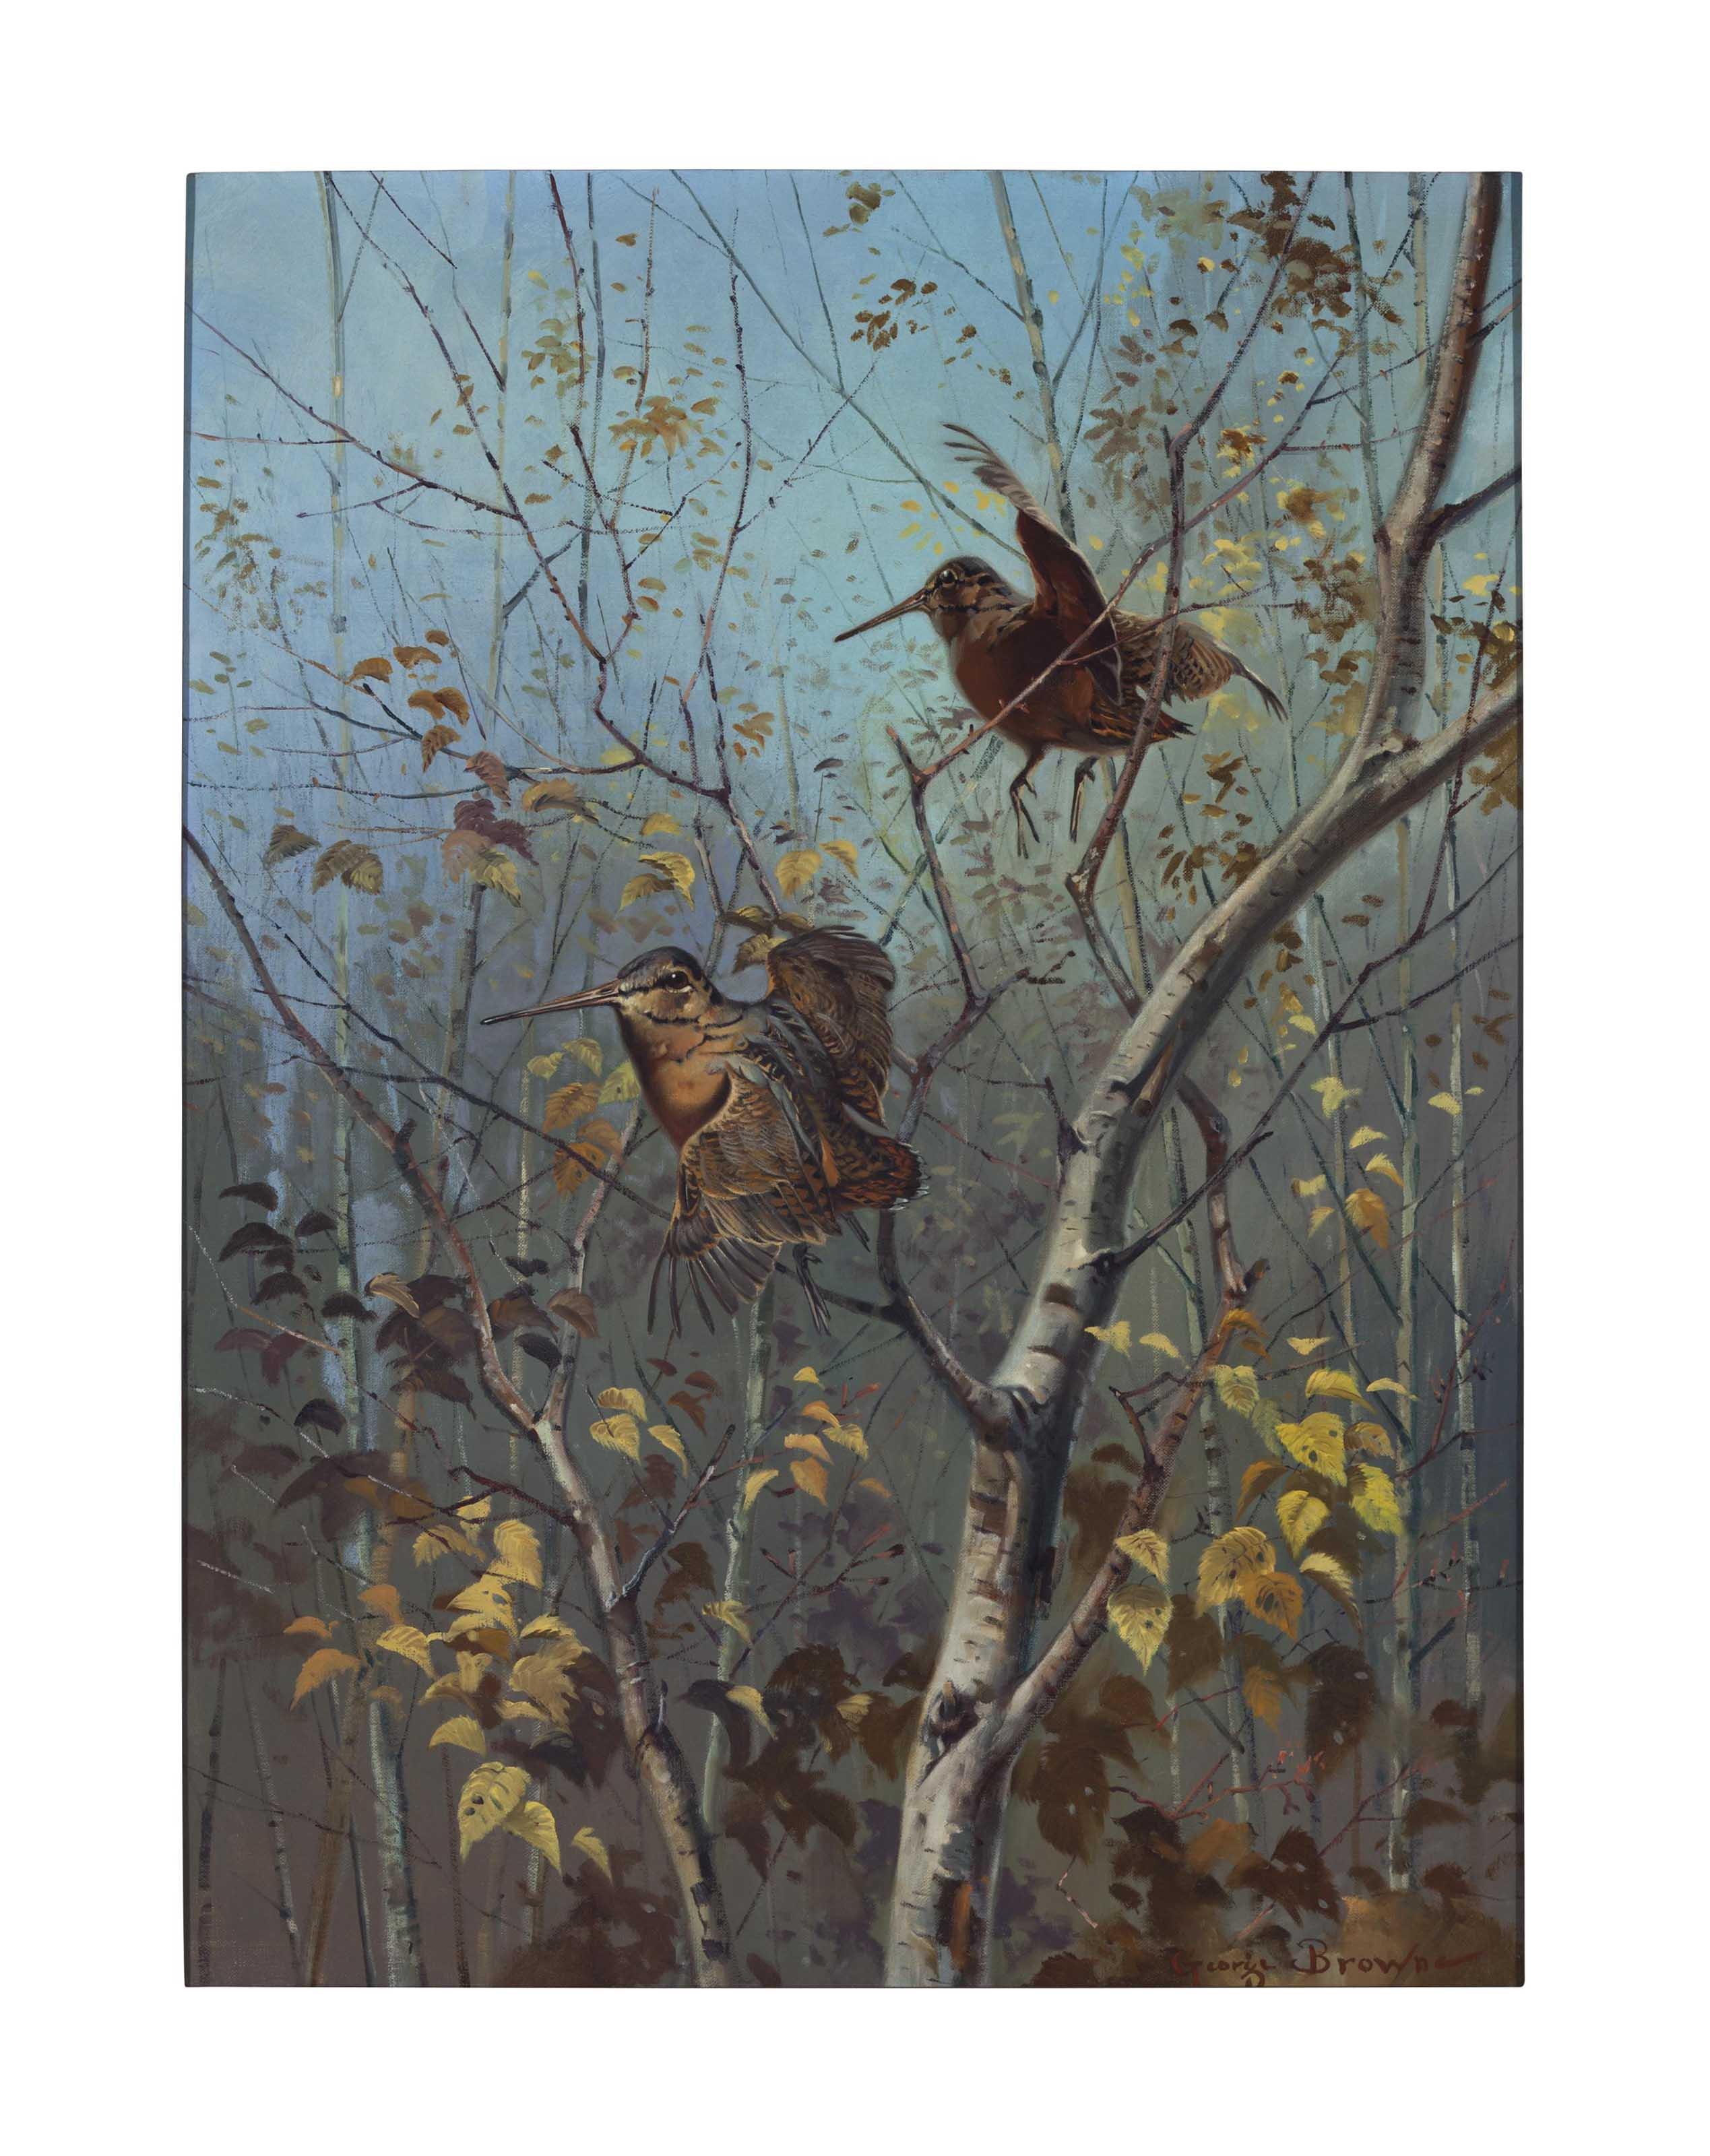 Autumn Cover, Woodcock